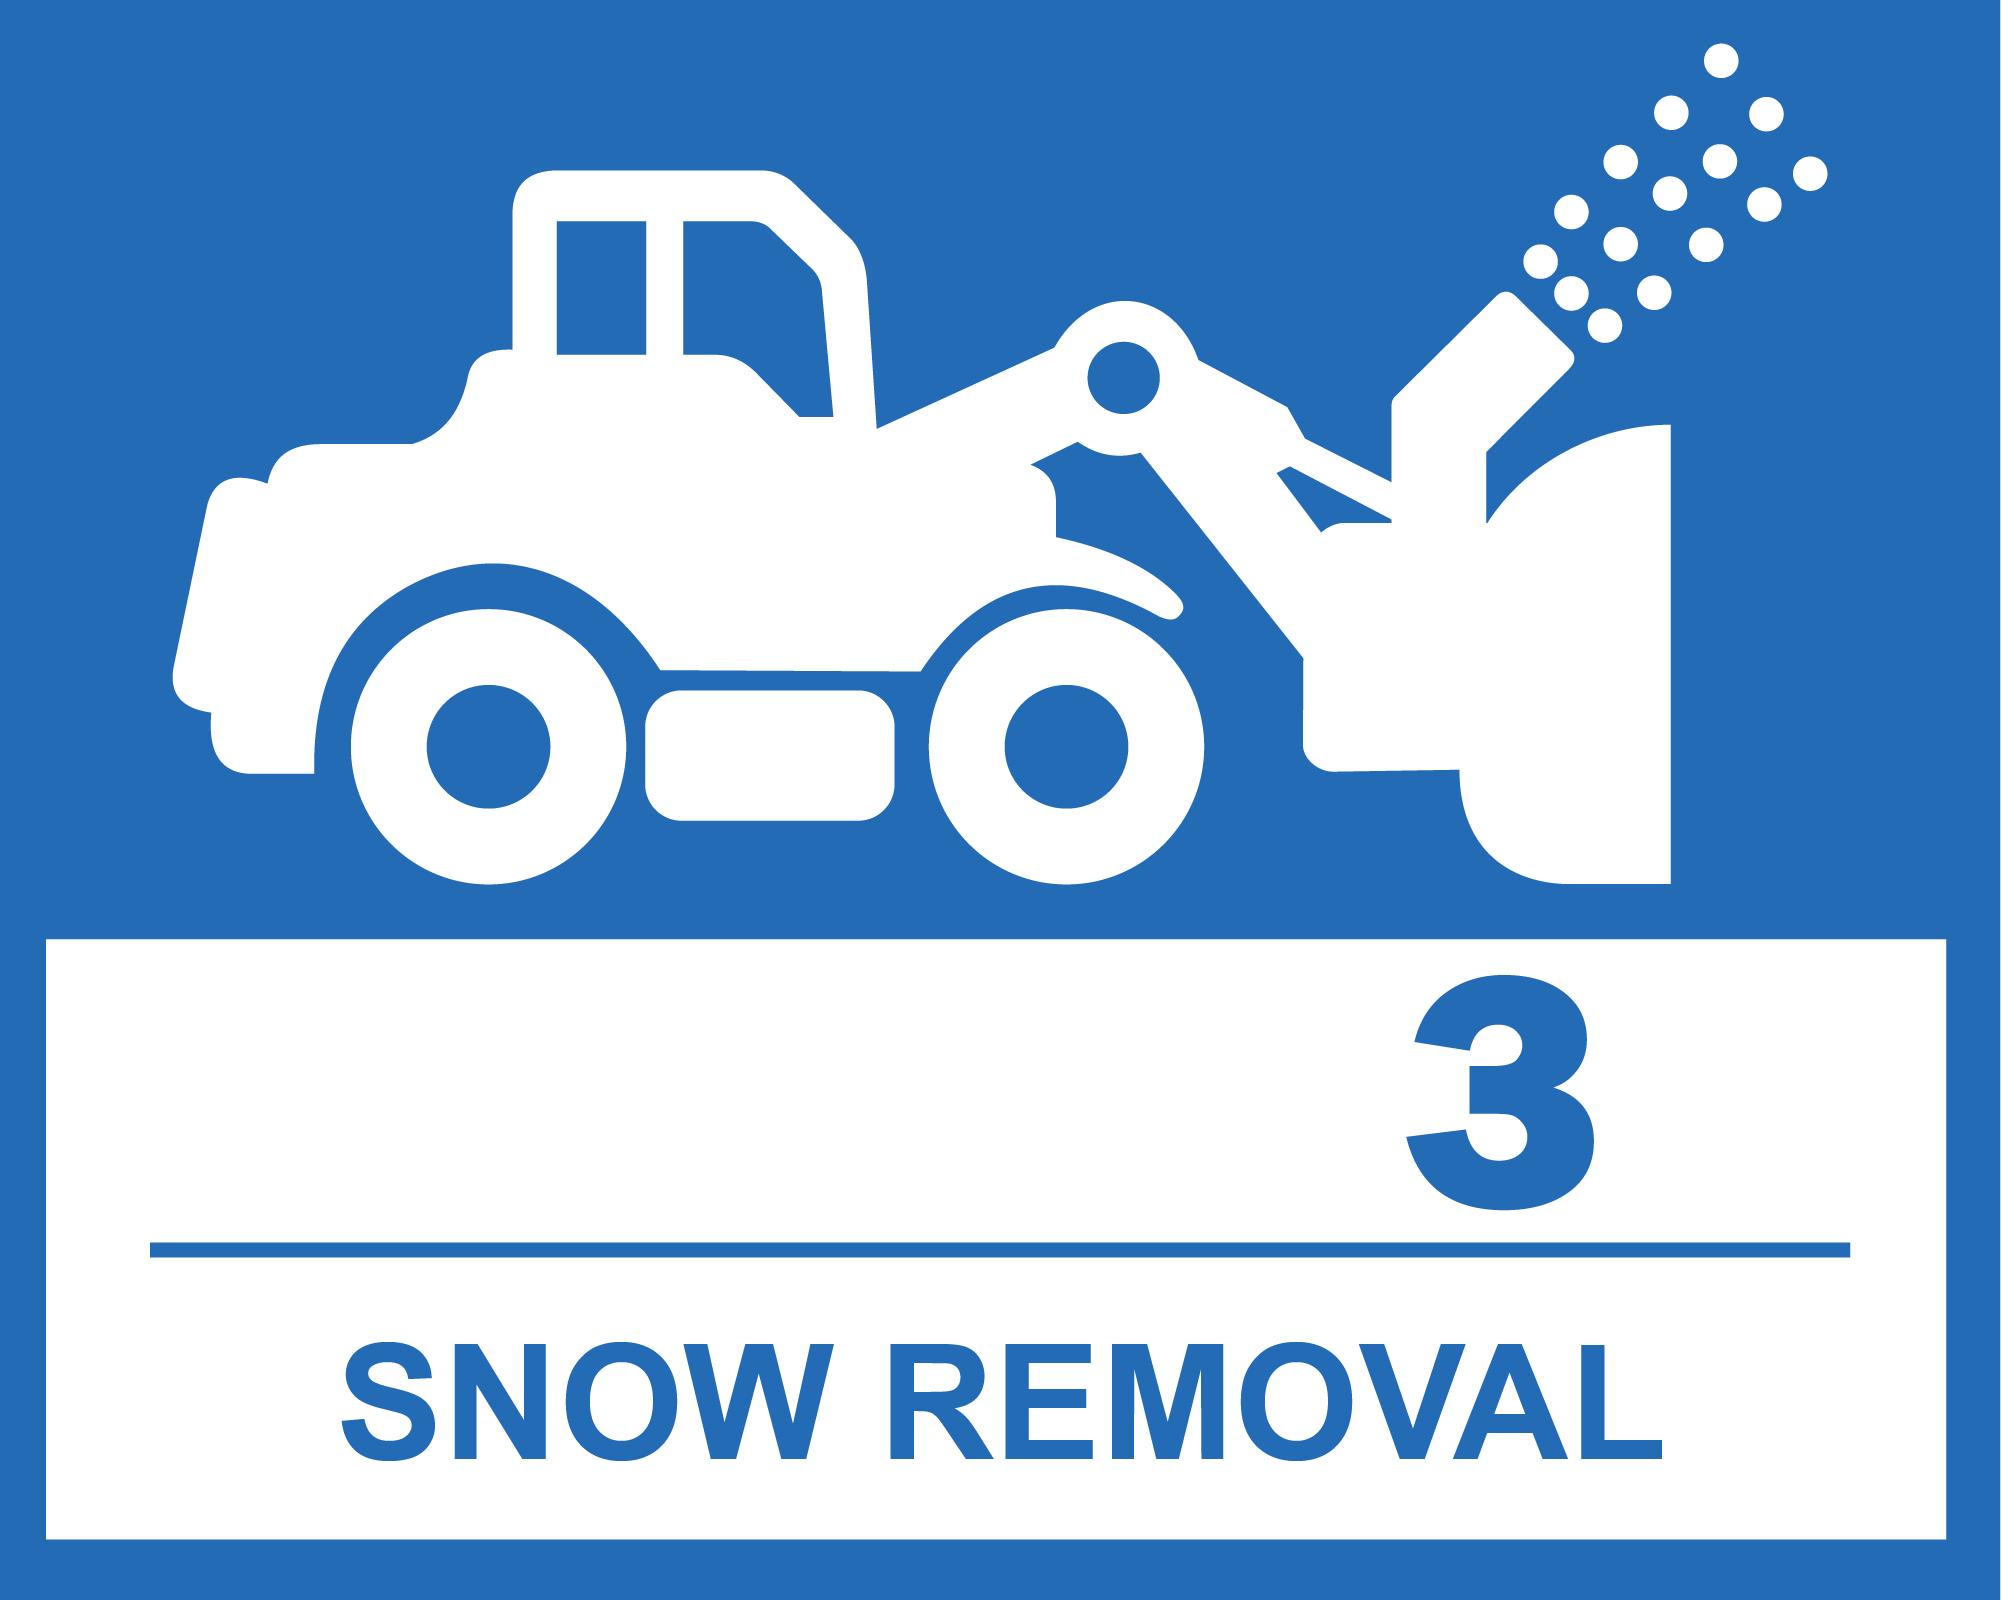 3 - Snow Removal